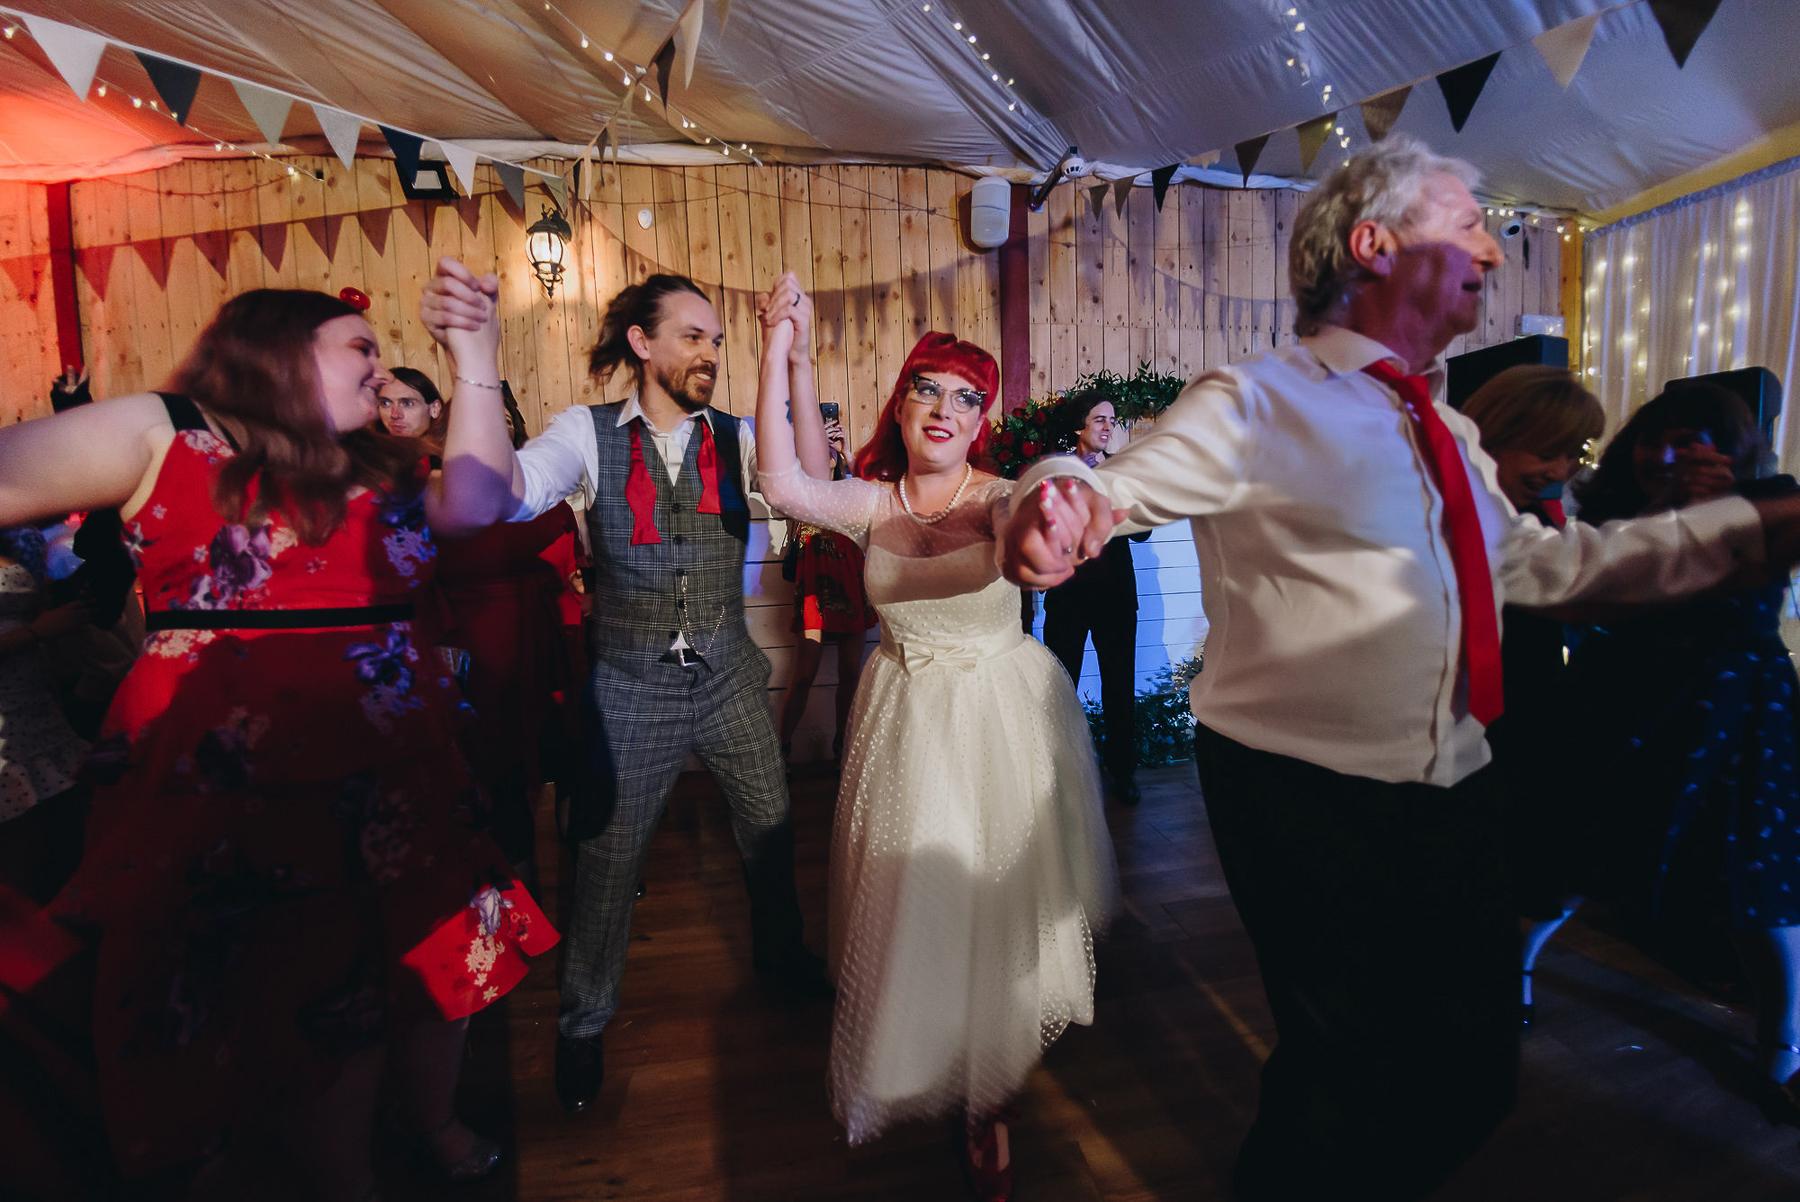 Wellbeing_Farm_Wedding_Photography_The_Pin-Up_Bride_Lara_Shaun-166.jpg